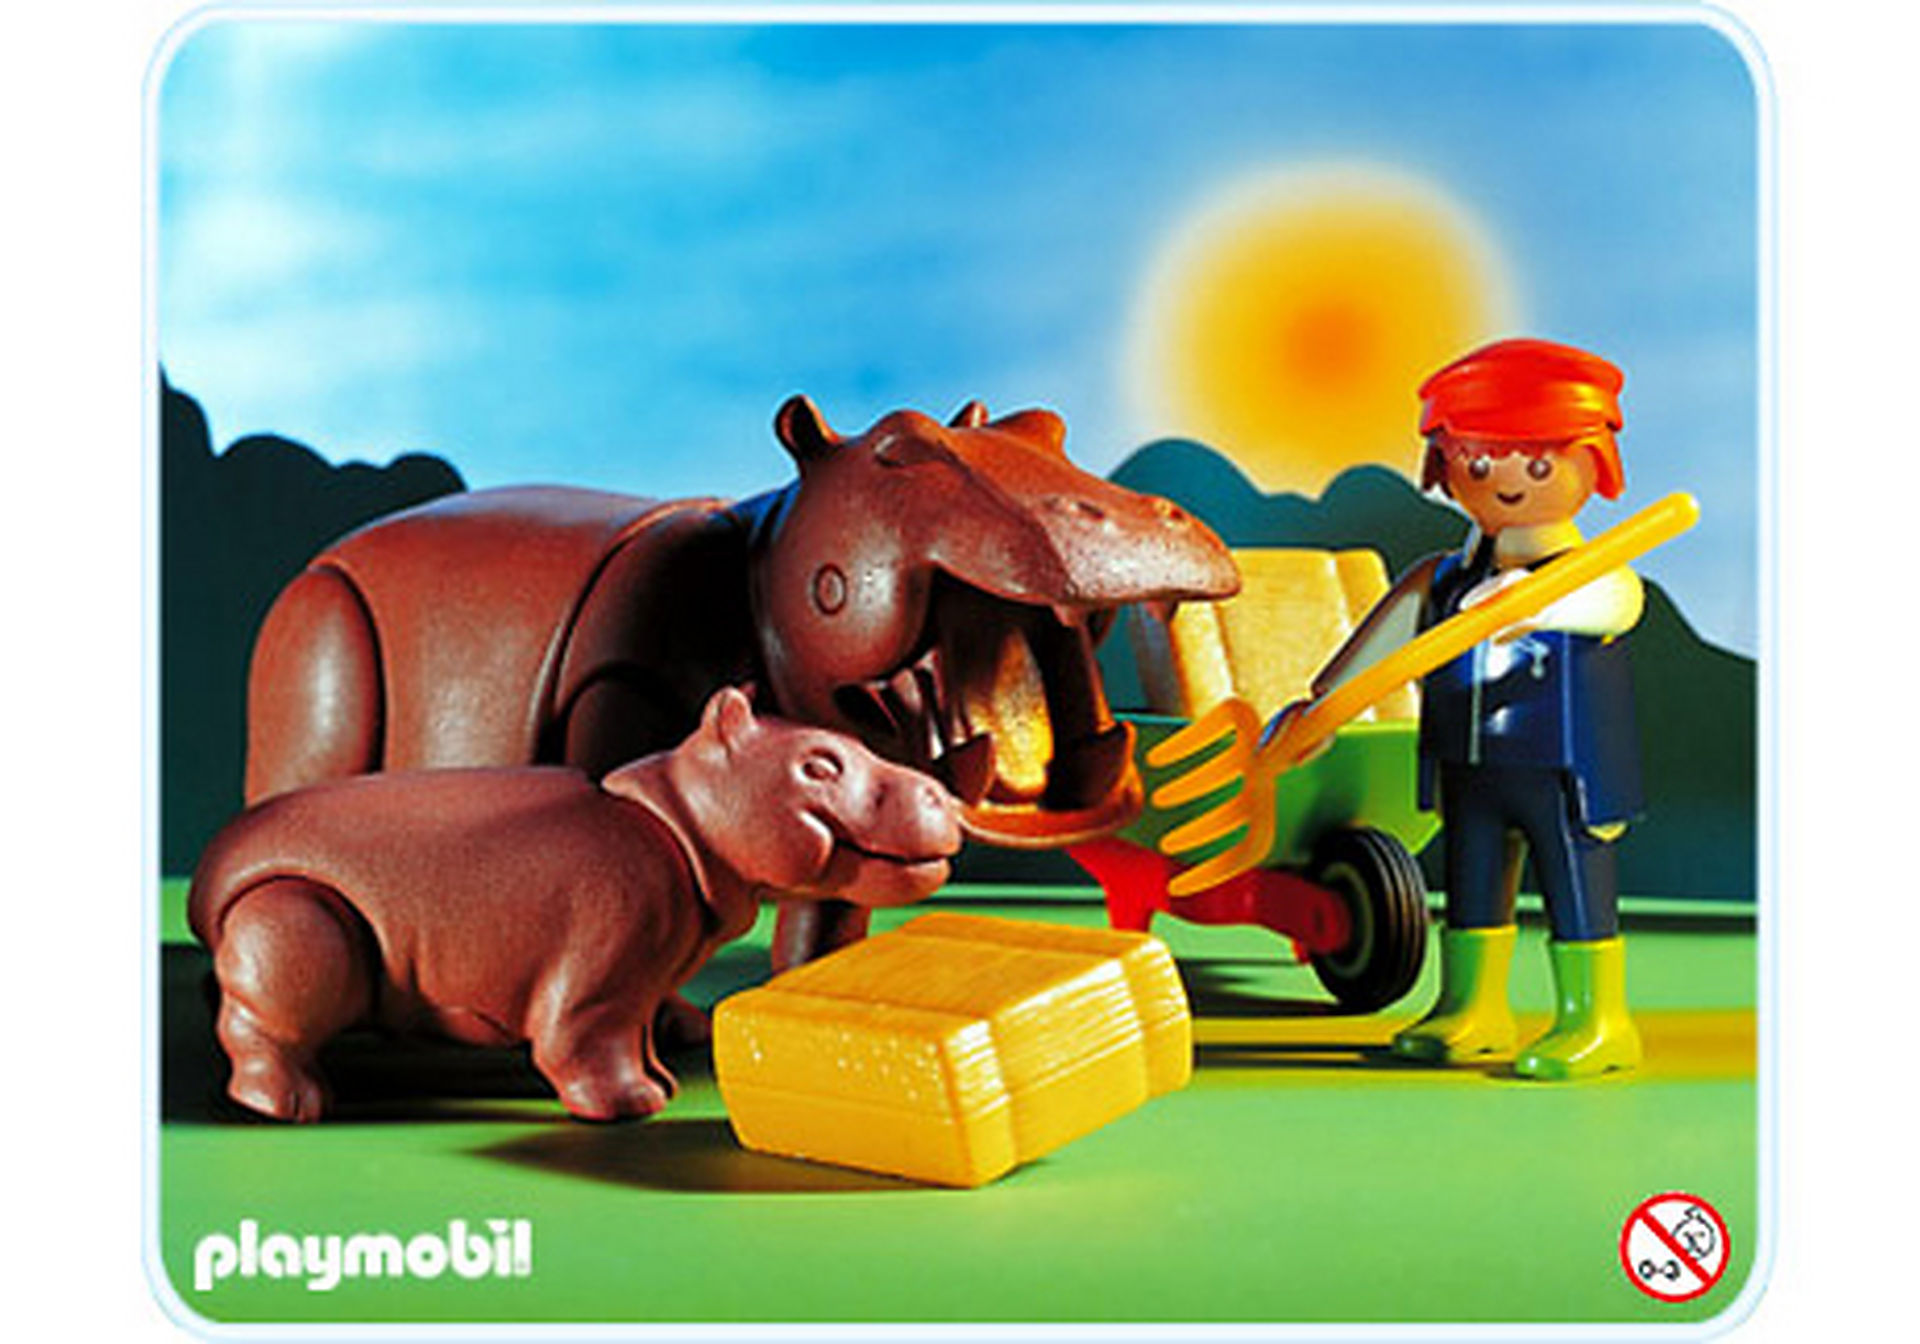 http://media.playmobil.com/i/playmobil/3639-A_product_detail/Flusspferd mit Baby